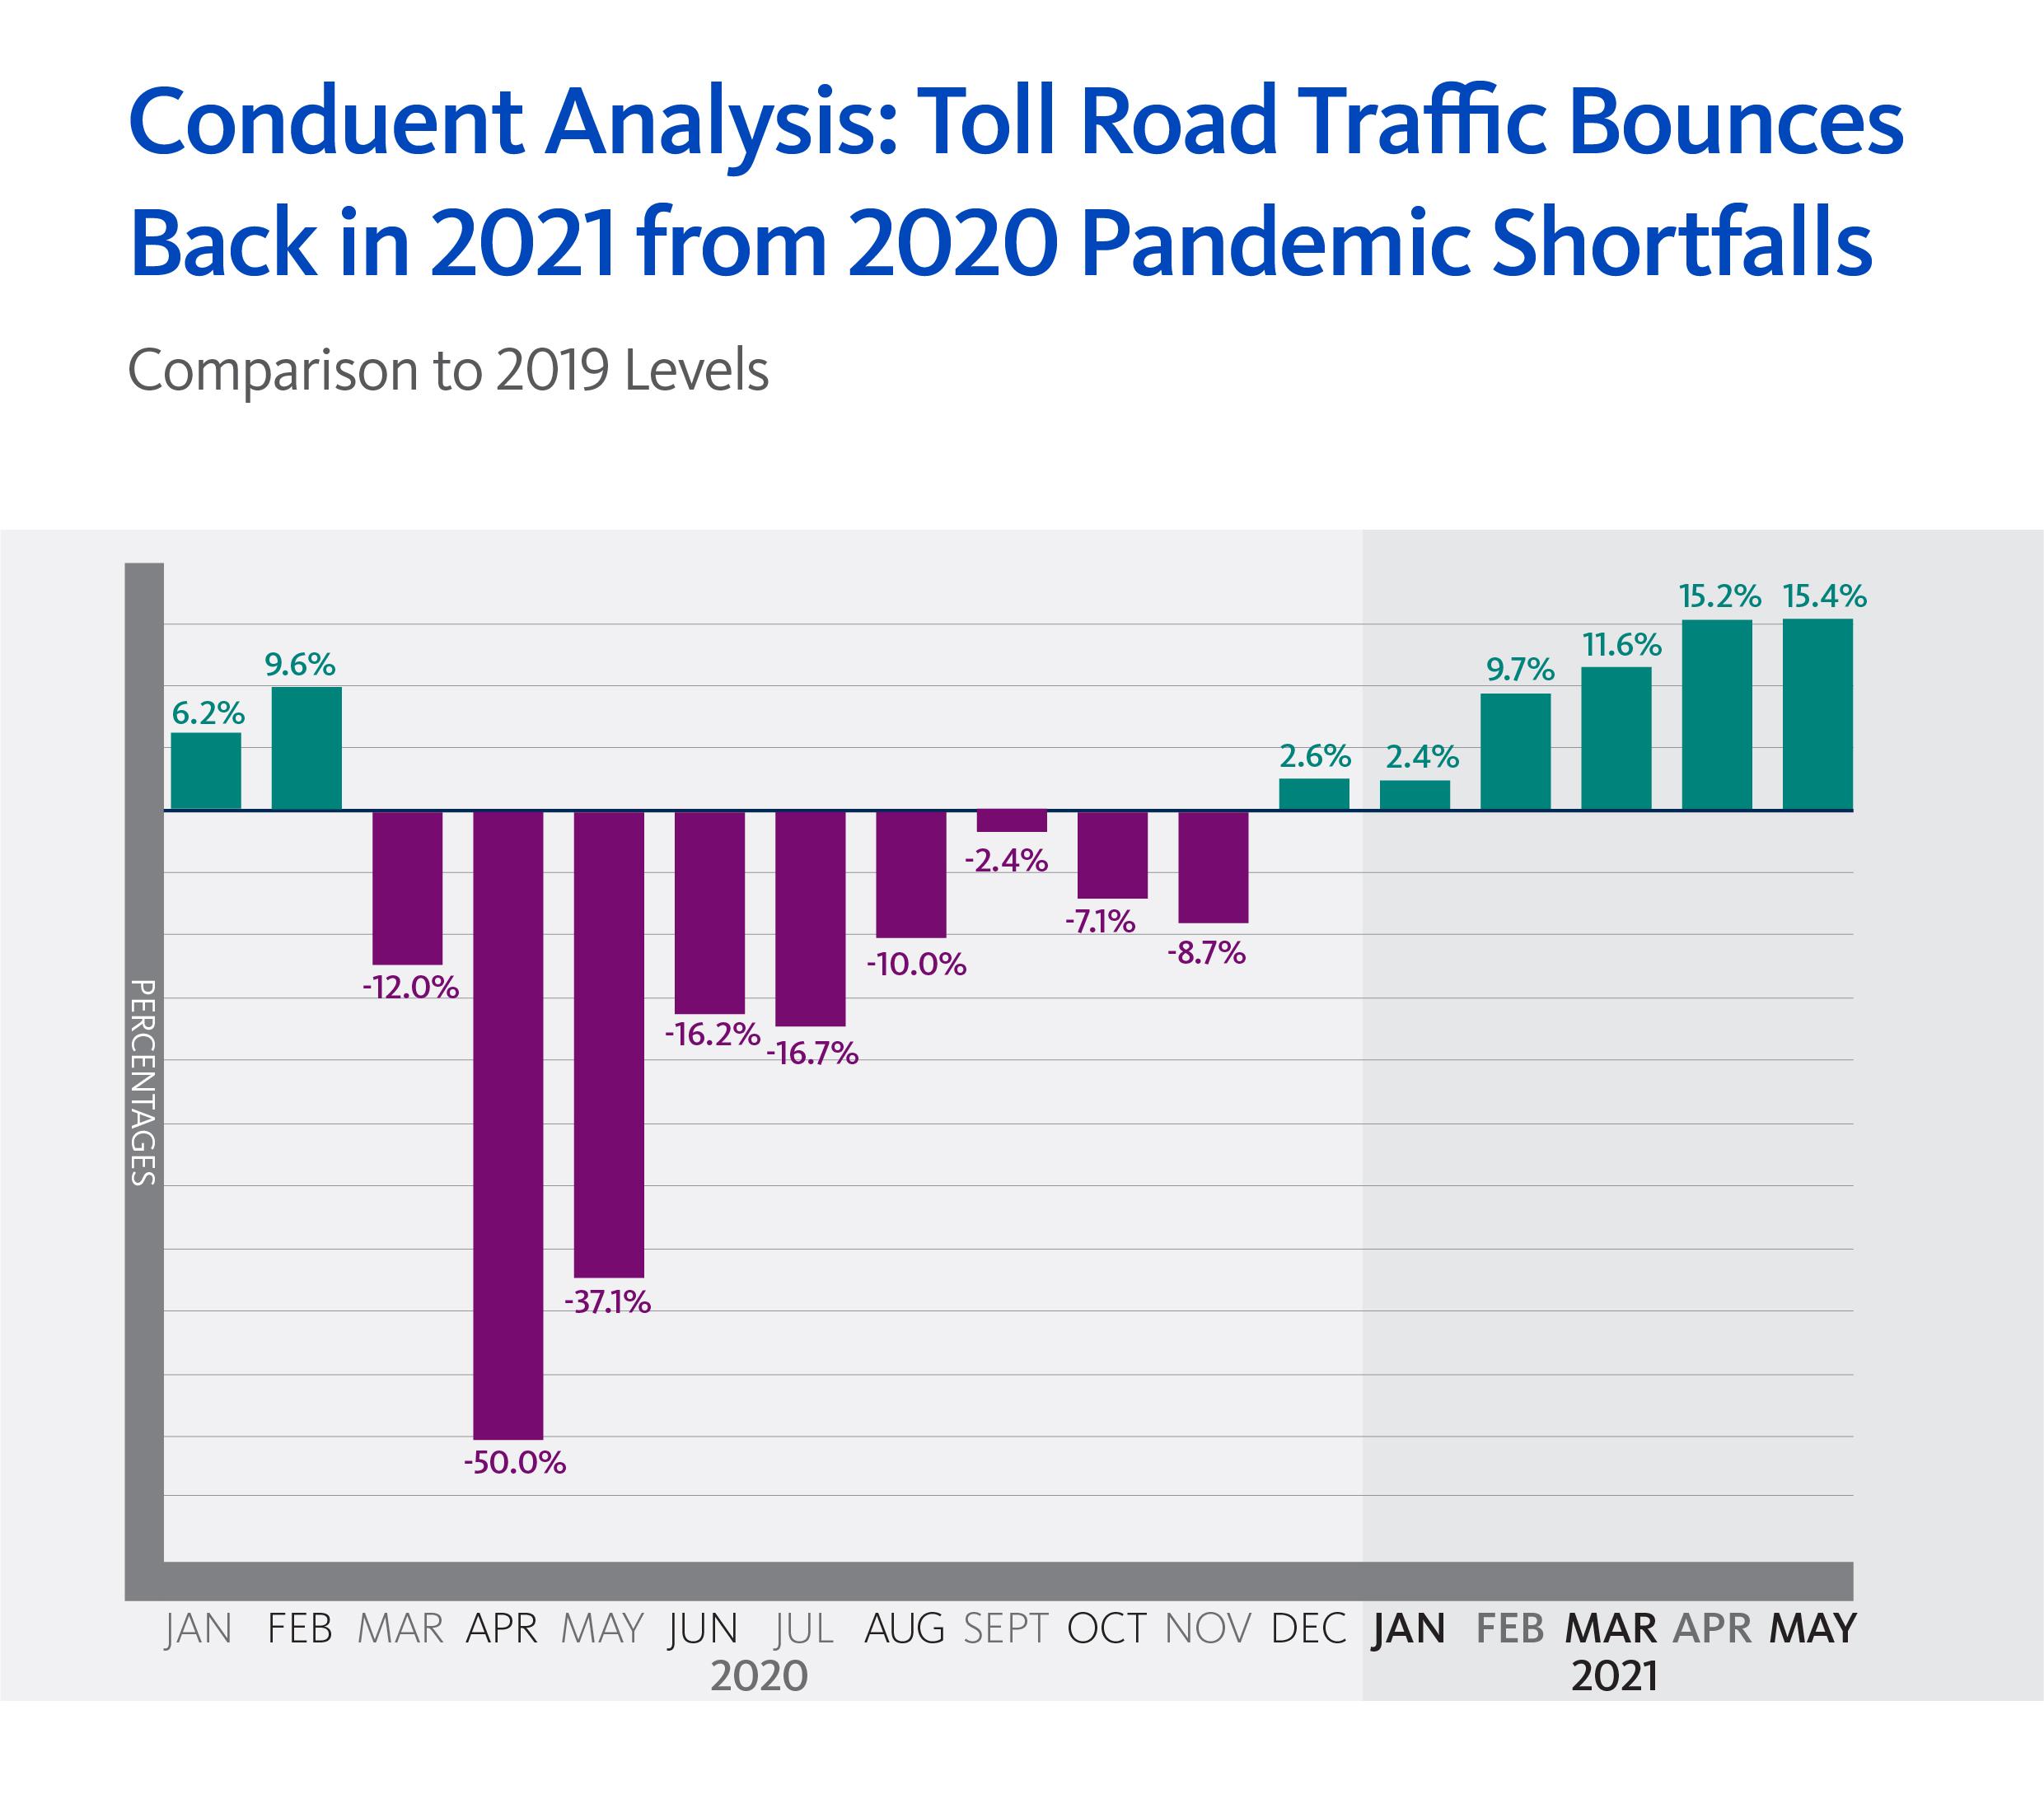 Conduent Transportation Tolling Data Analysis_Infographic June 2021 1